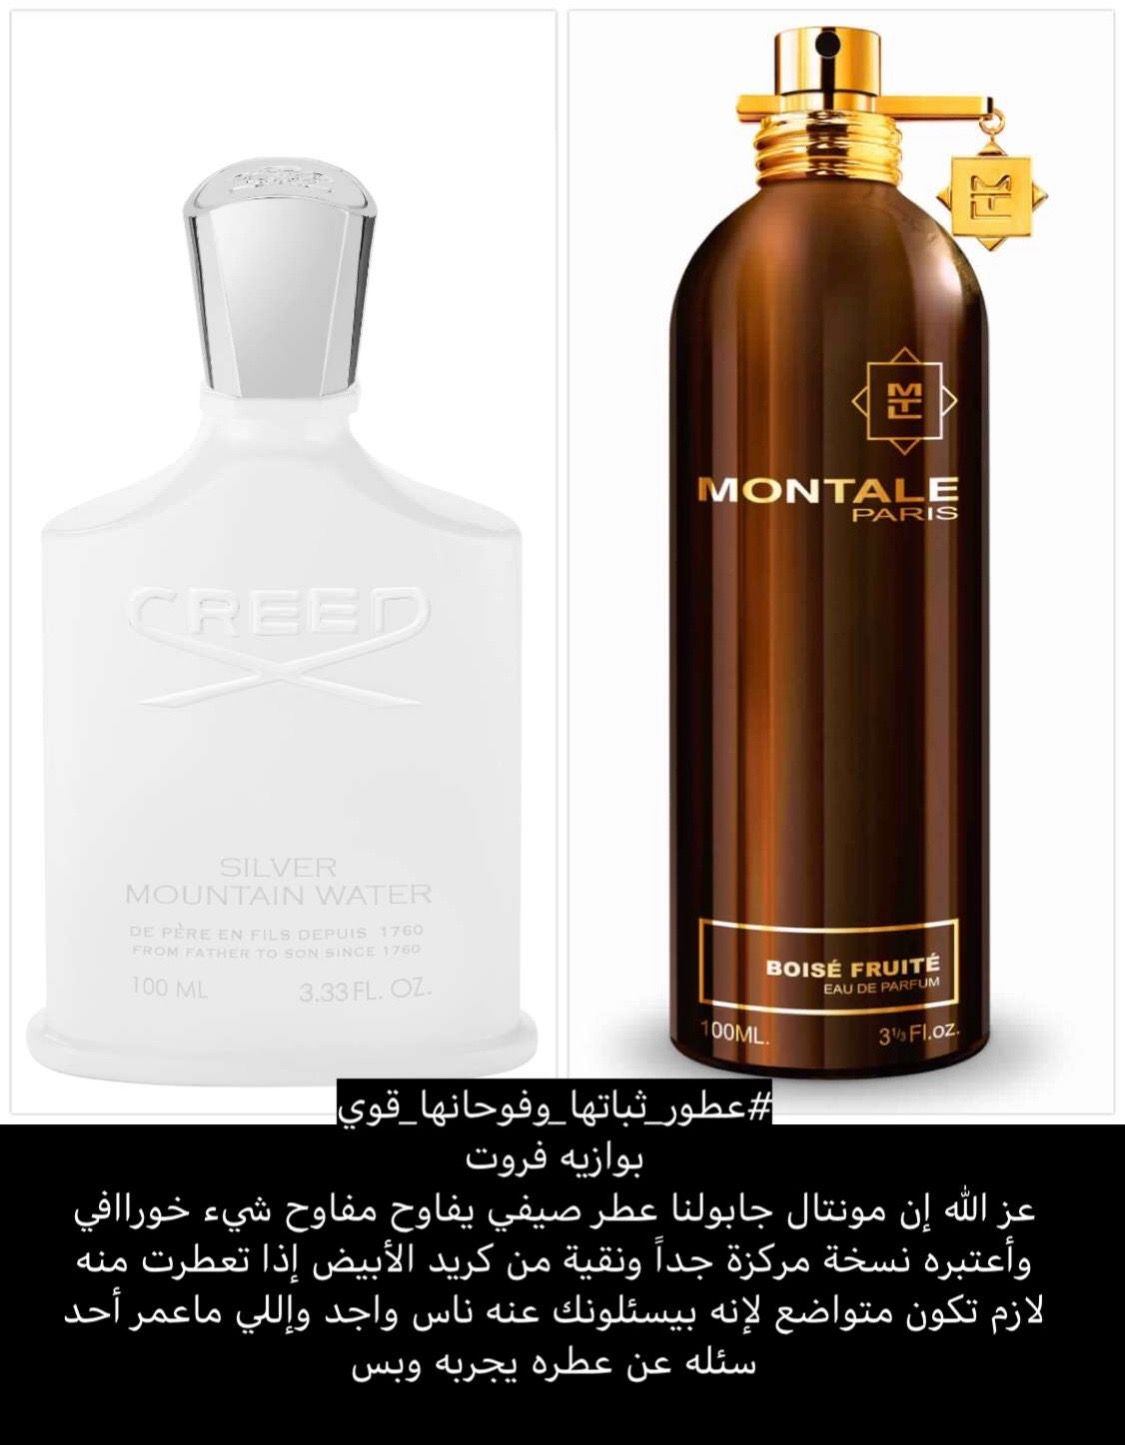 Pin By Samar Anan On عطور فرنسية Perfume Scents Fragrance Shampoo Bottle